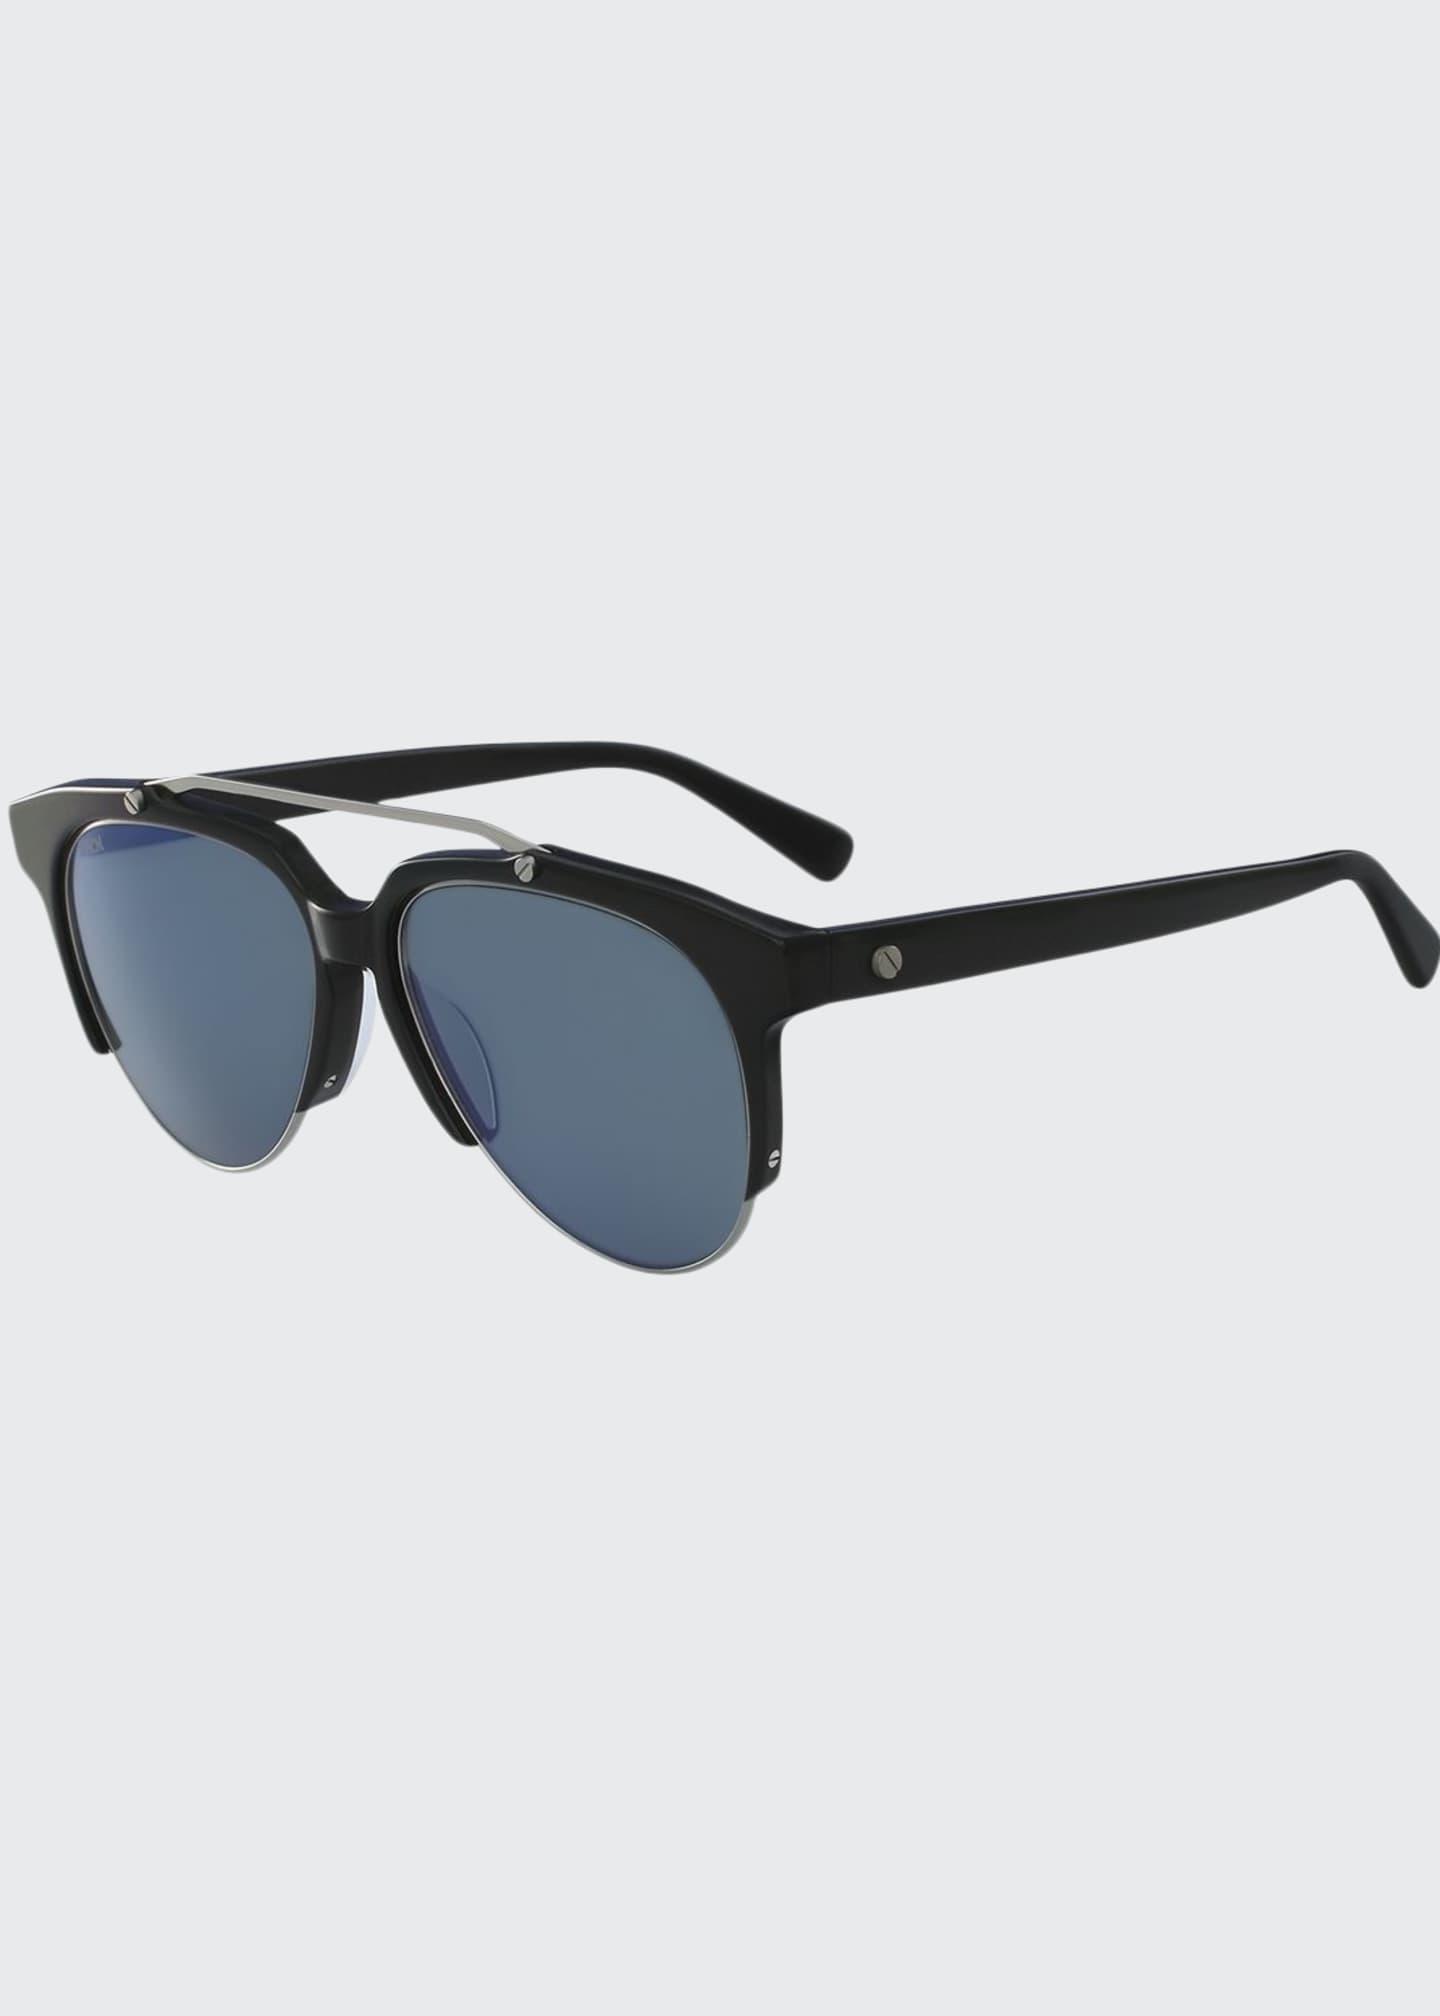 MCM Acetate & Metal Aviator Sunglasses, Black